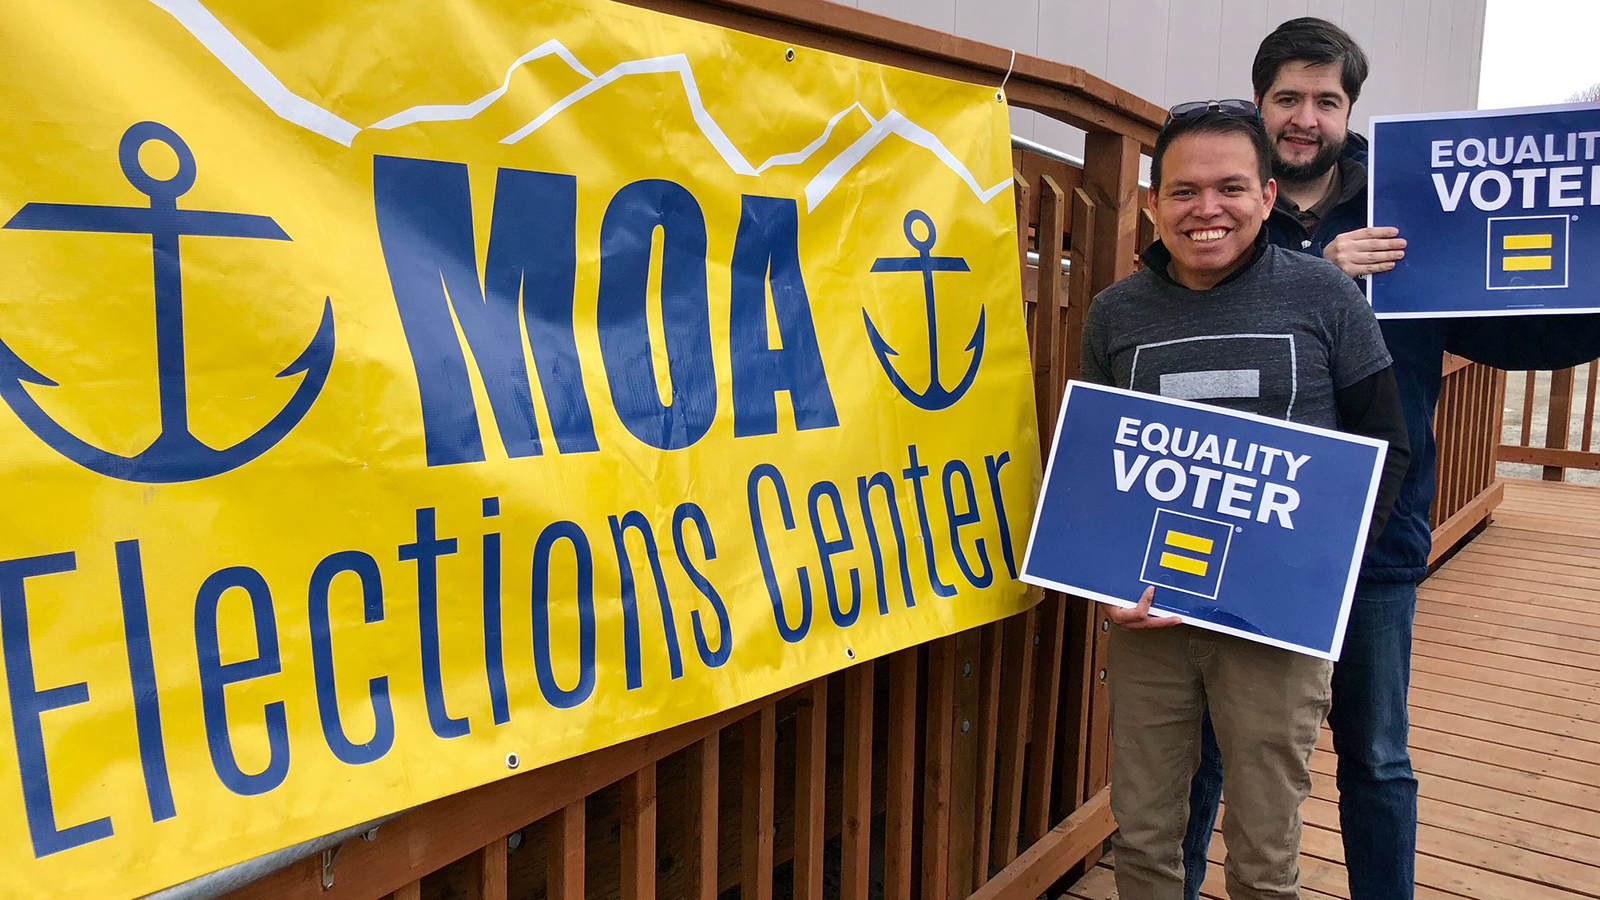 Despite Anti-LGBTQ Efforts, Equality Pushing Forward